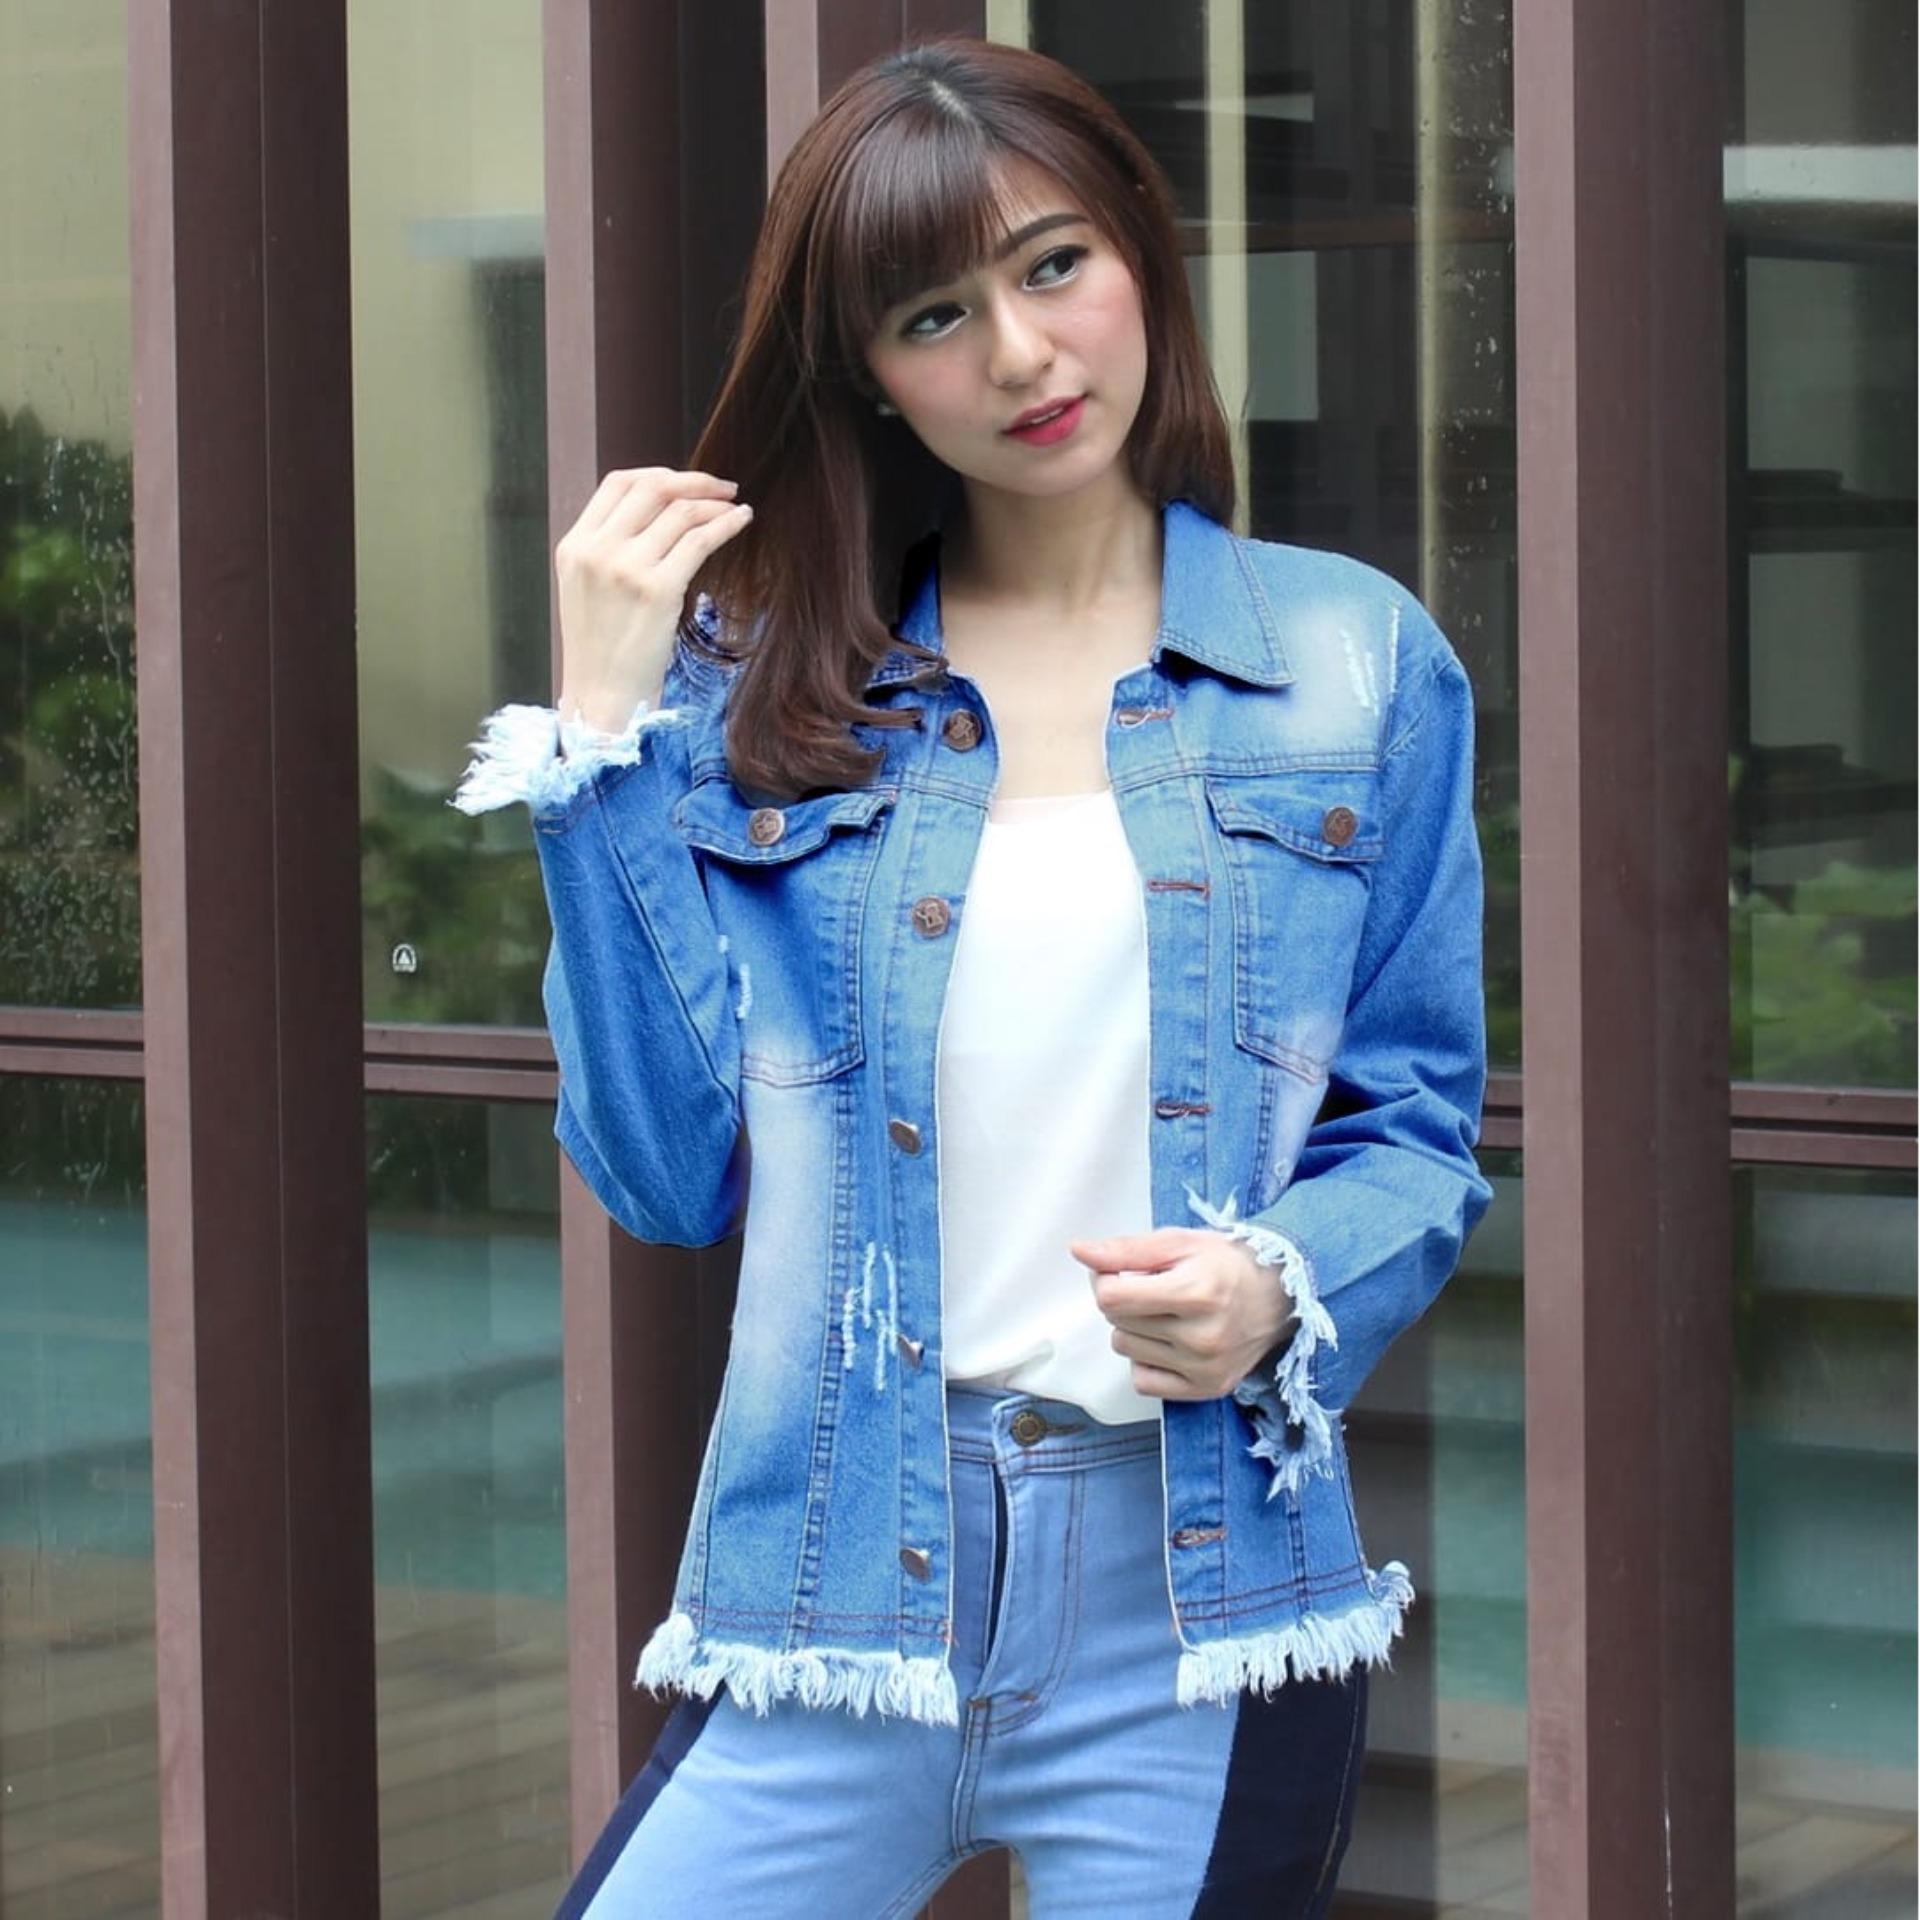 Cek Harga Baru Vrichel Jaket Blazer Jeans Wanita Big Size Cewe Premium Clara